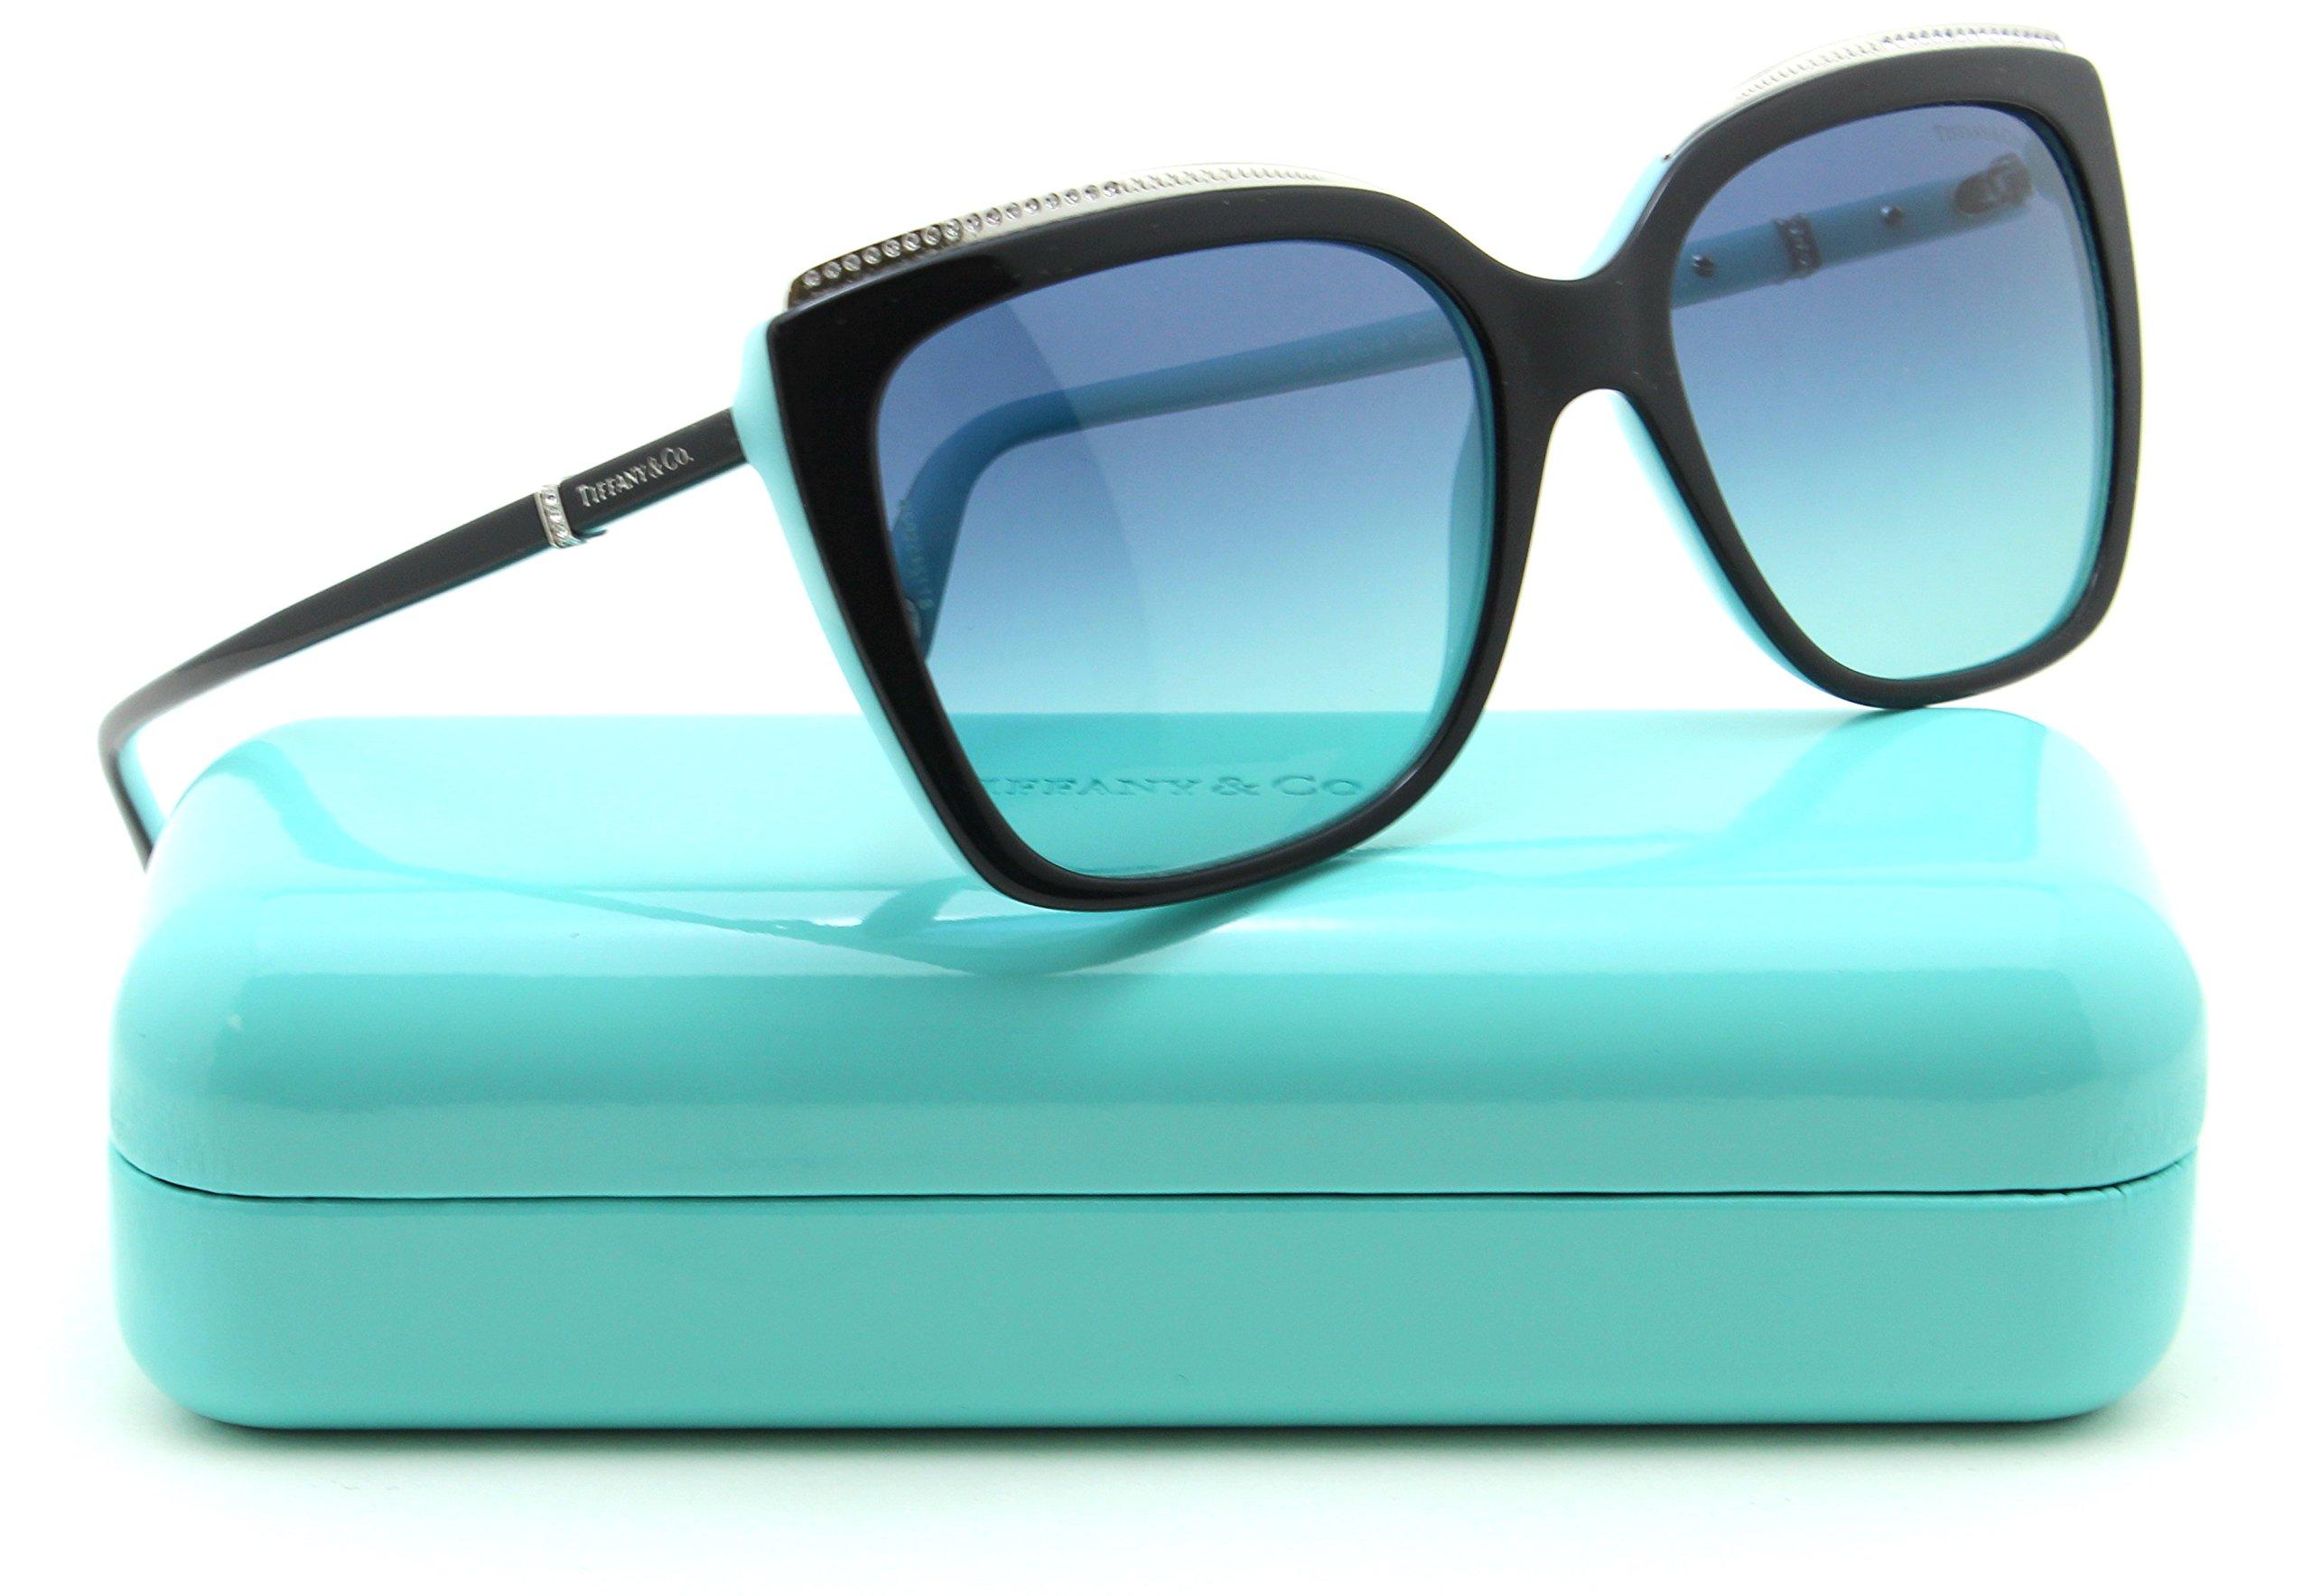 Tiffany & Co. TF 4135-B-F Women Square Asian Fit Sunglasses (Blue Gradient 80559S, 56)